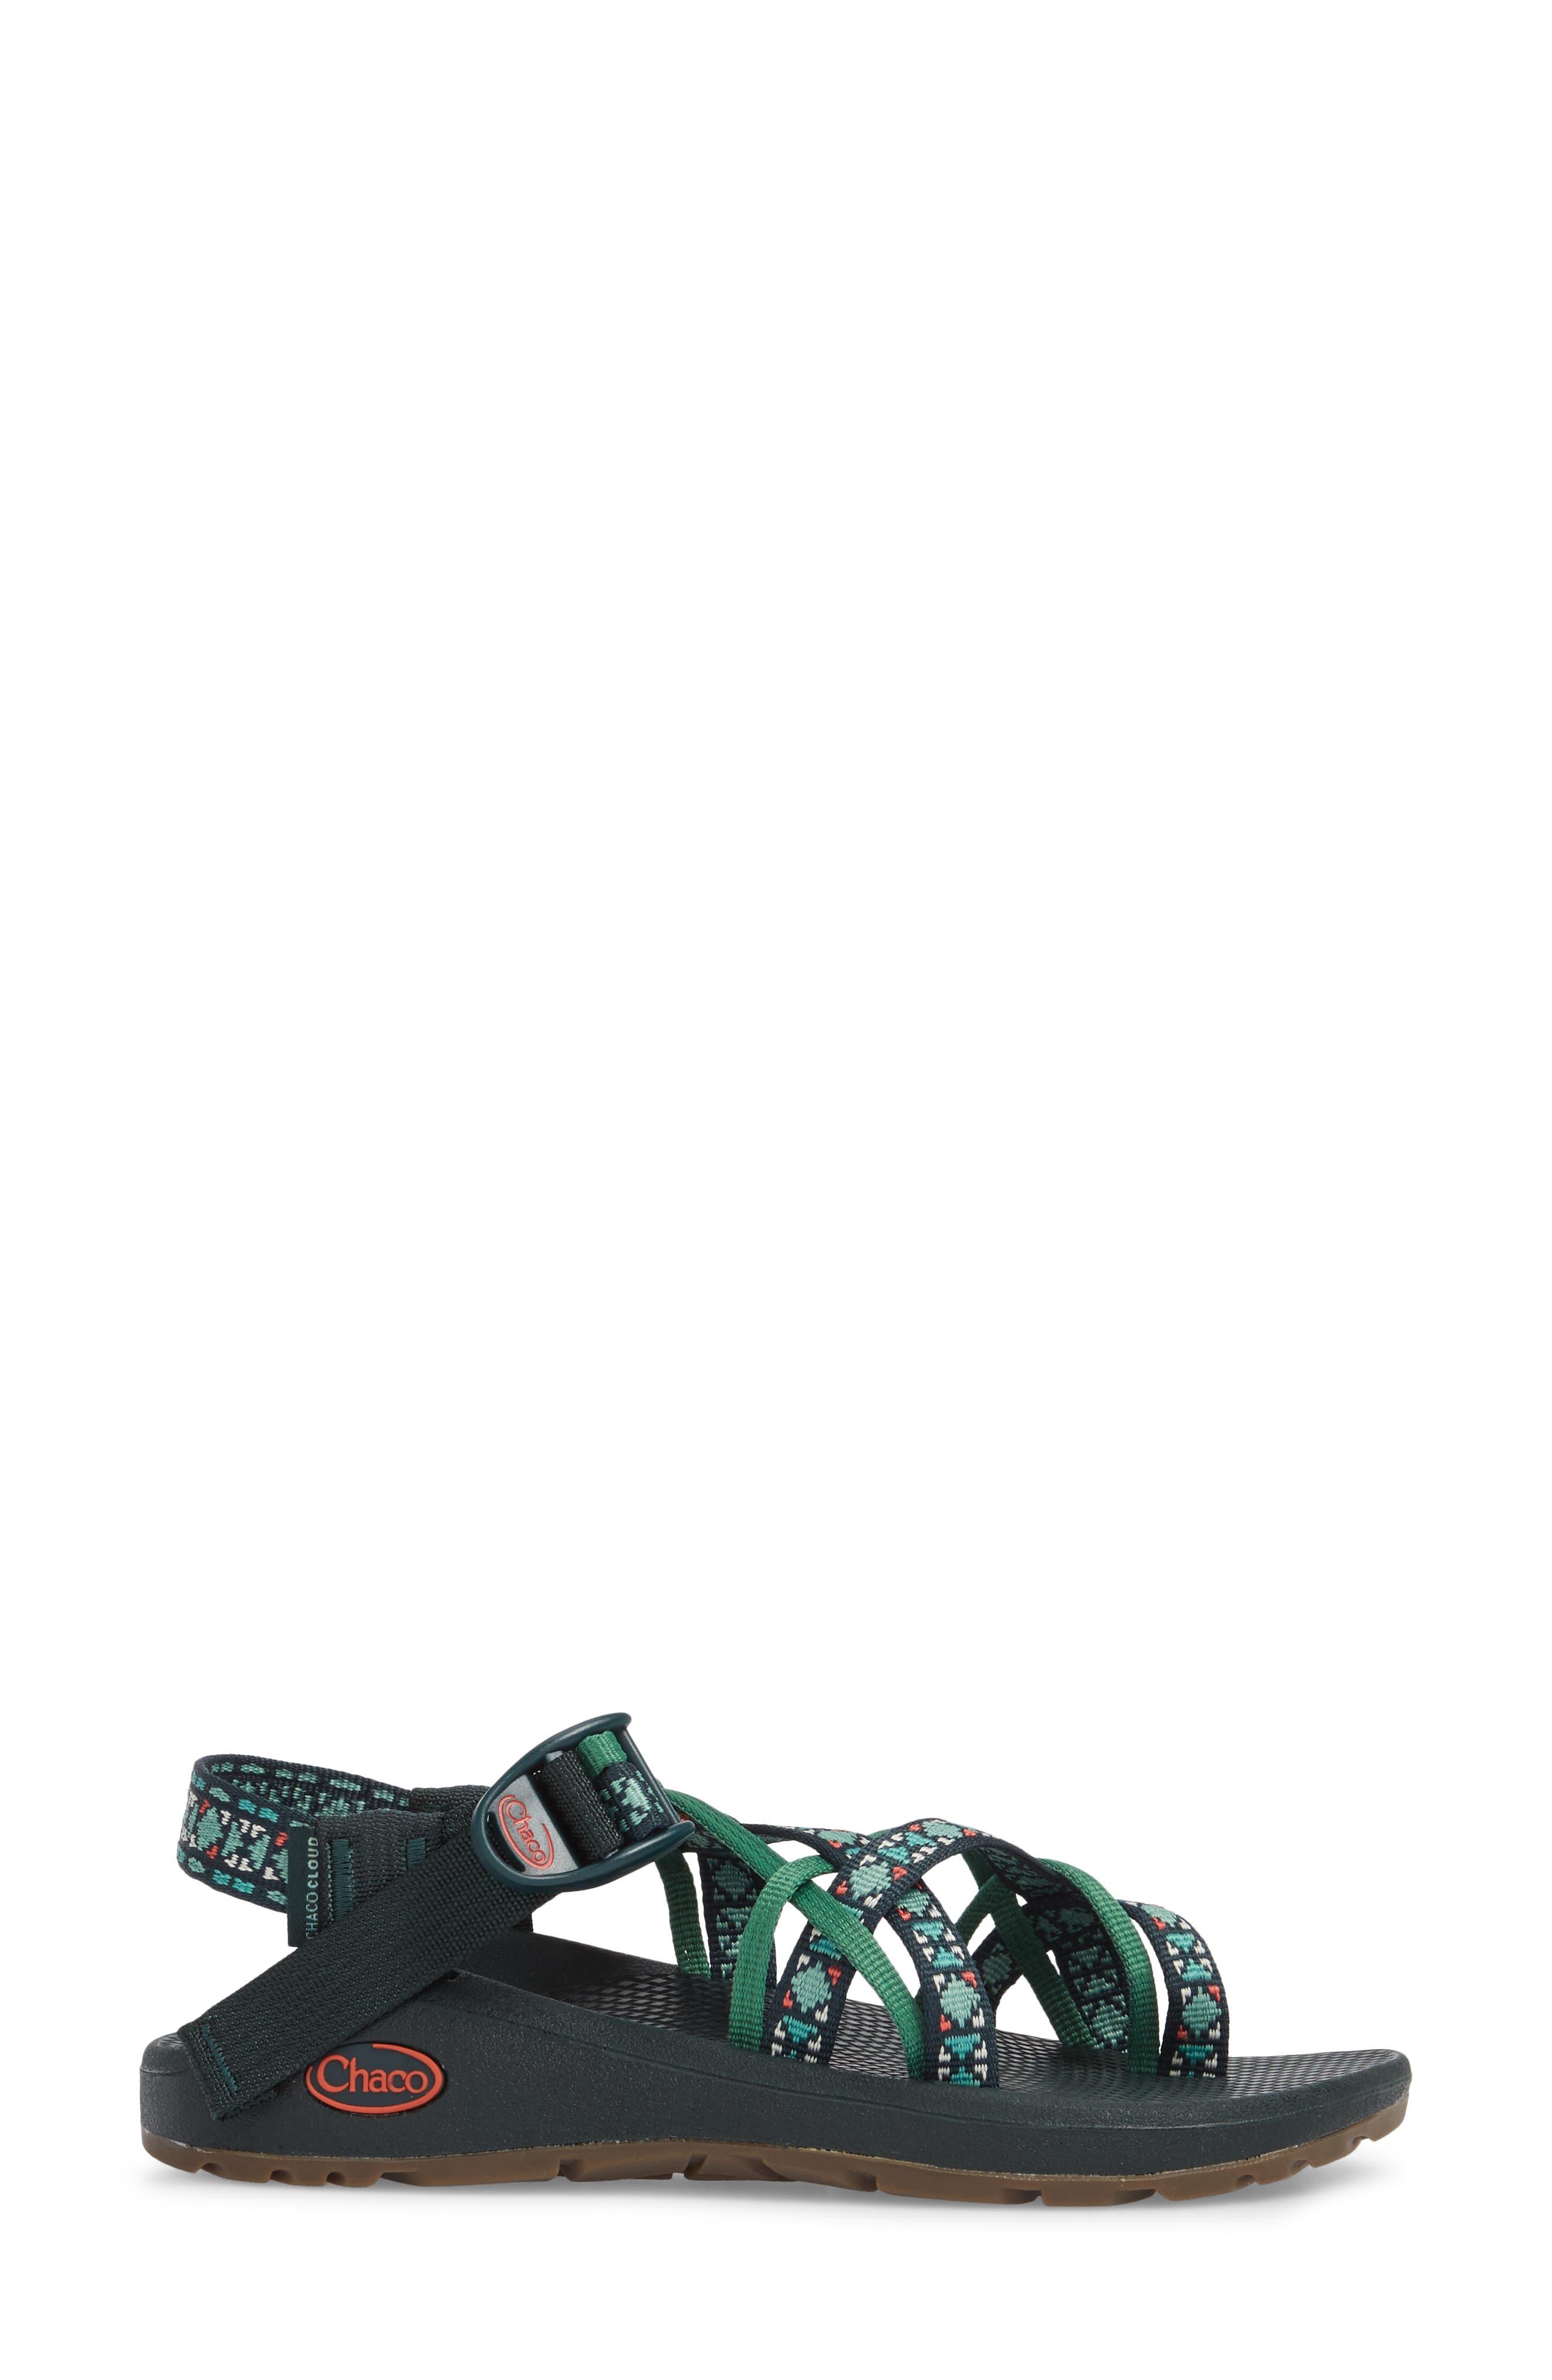 Z/Cloud X2 Remix Sport Sandal,                             Alternate thumbnail 3, color,                             CREED PINE